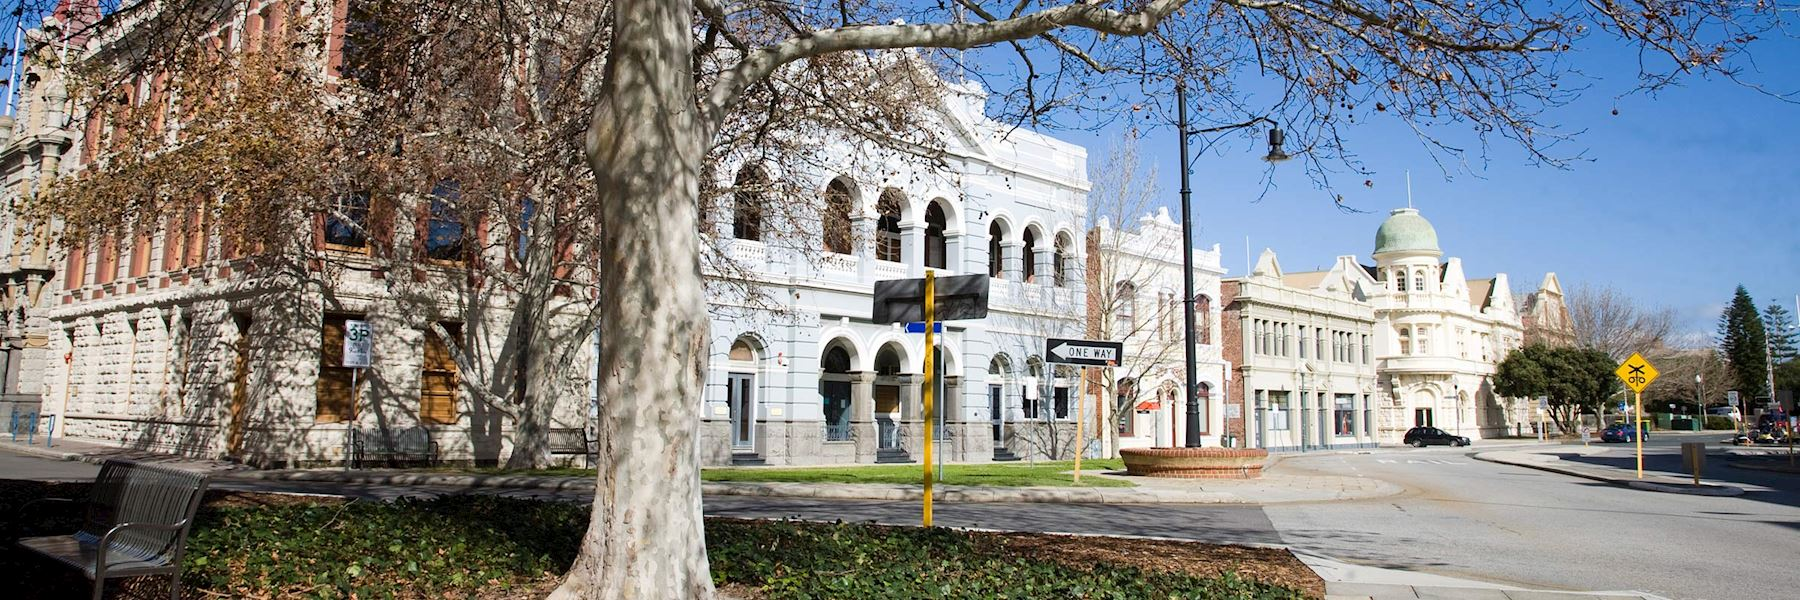 Visit Fremantle, Australia